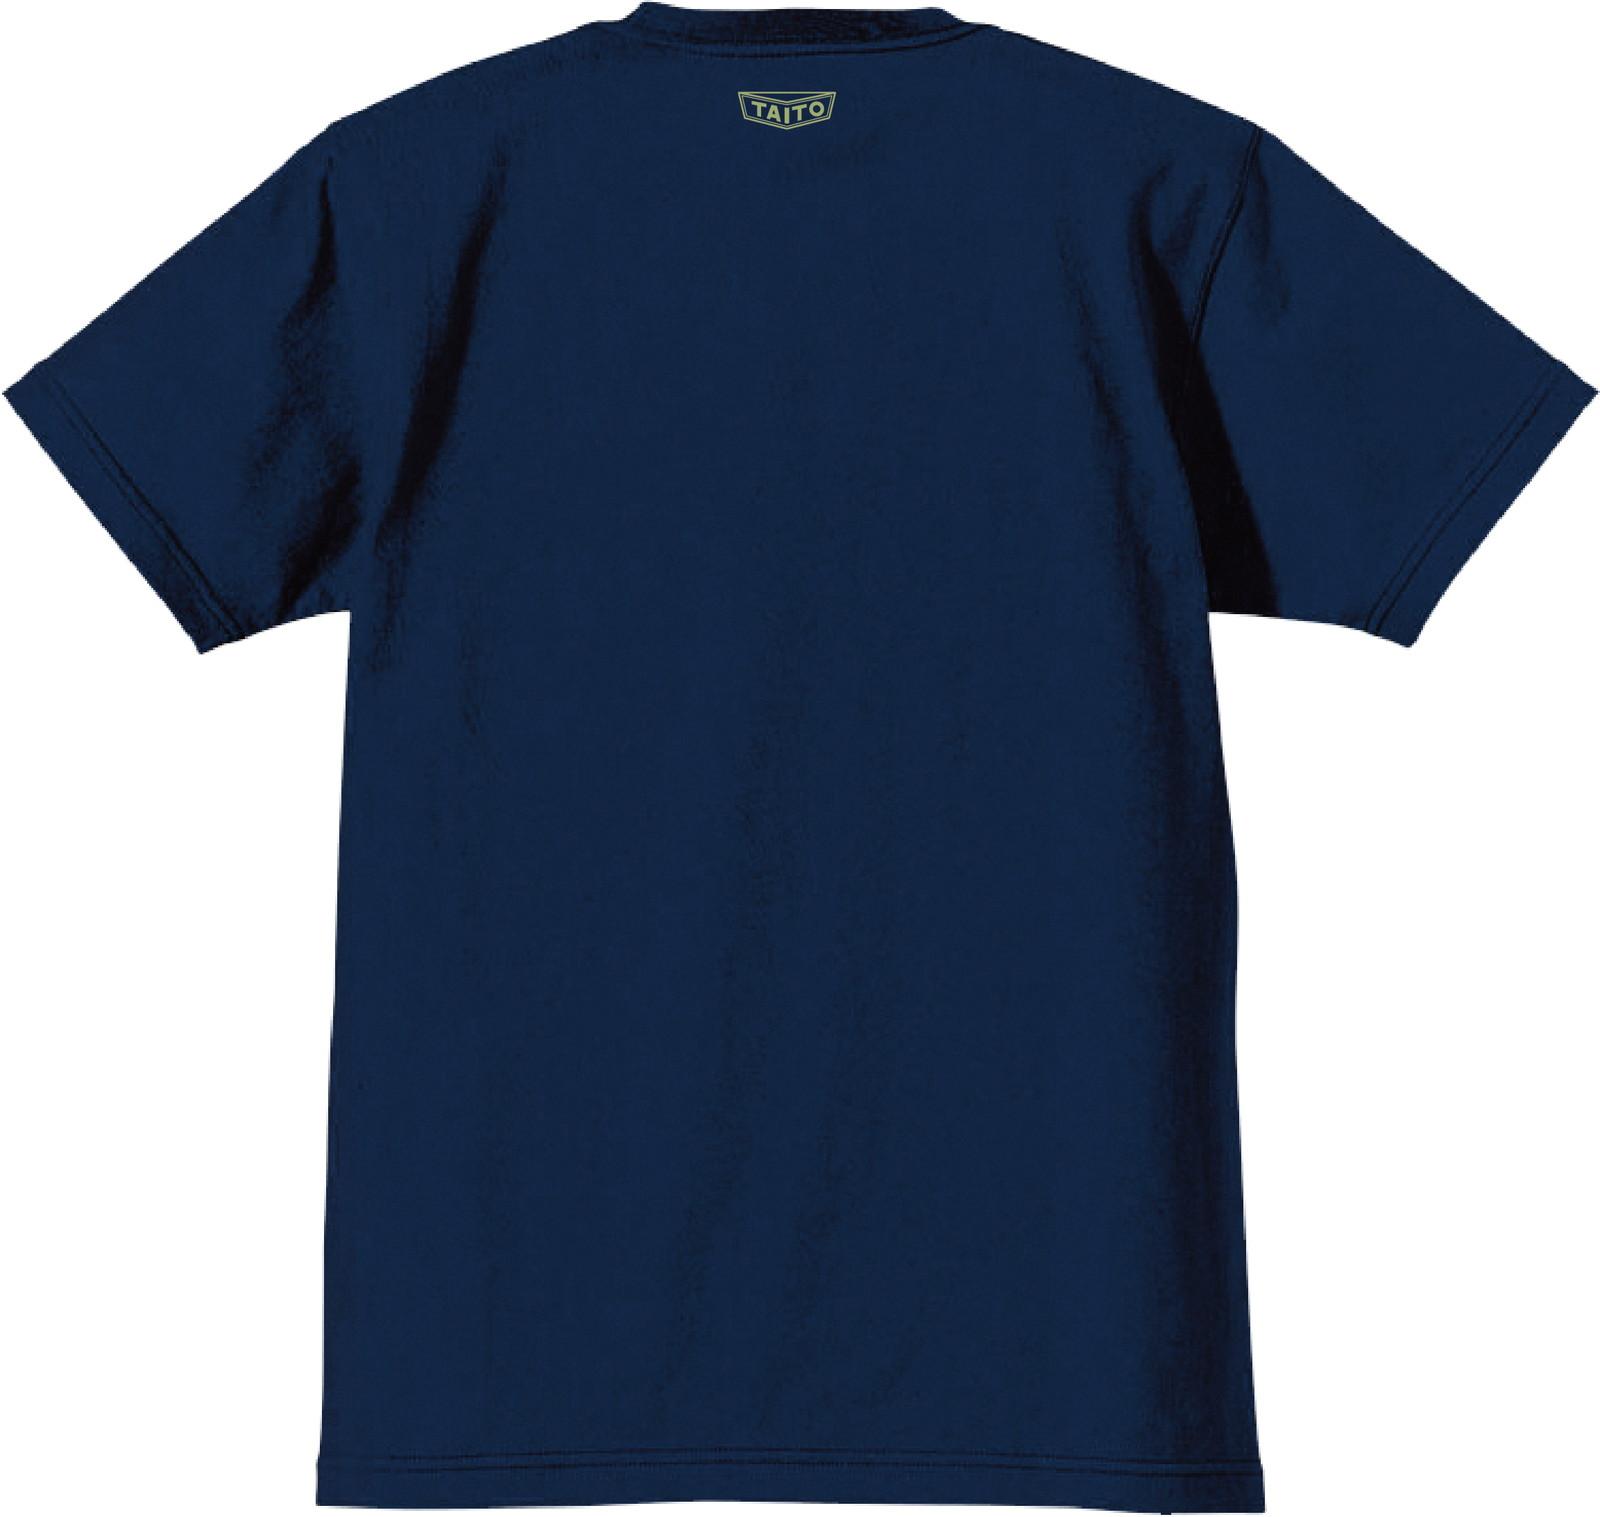 ZUNTATA ロゴ Tシャツ 1st ネイビー